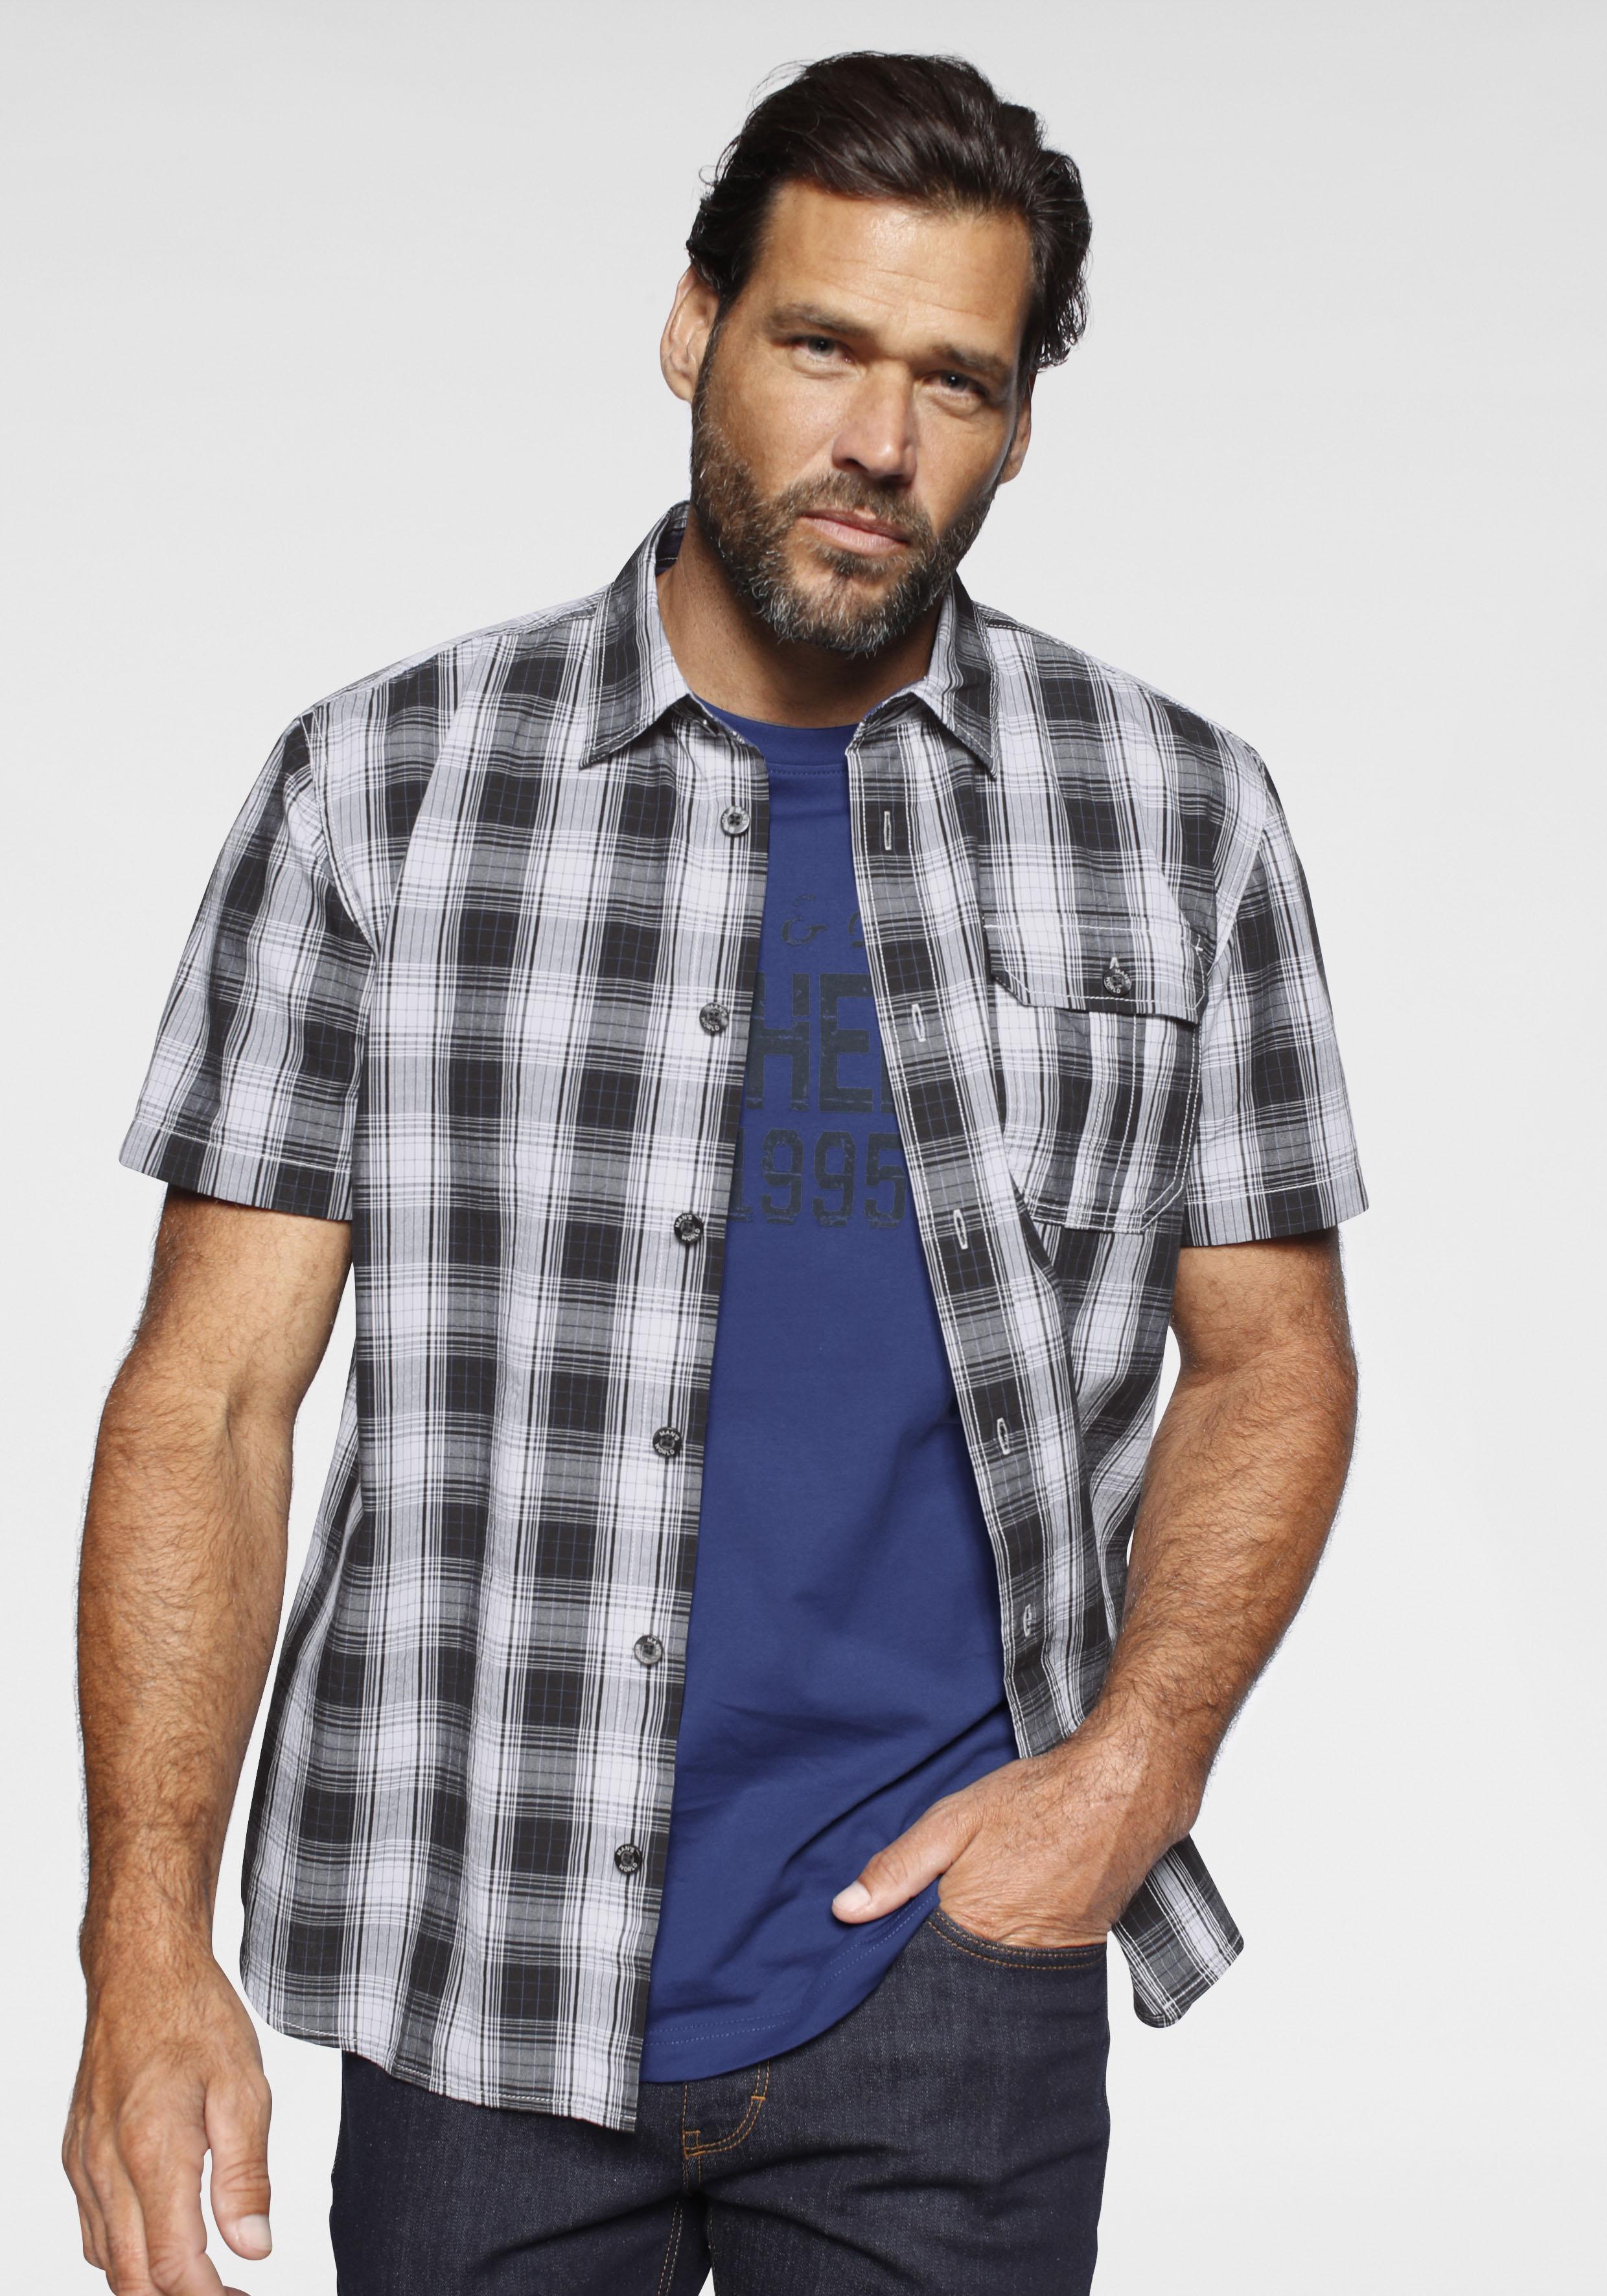 Hemden Herren Kurzarm Man/'s World Kurzarmhemd Set, 2 tlg., mit T-Shirt